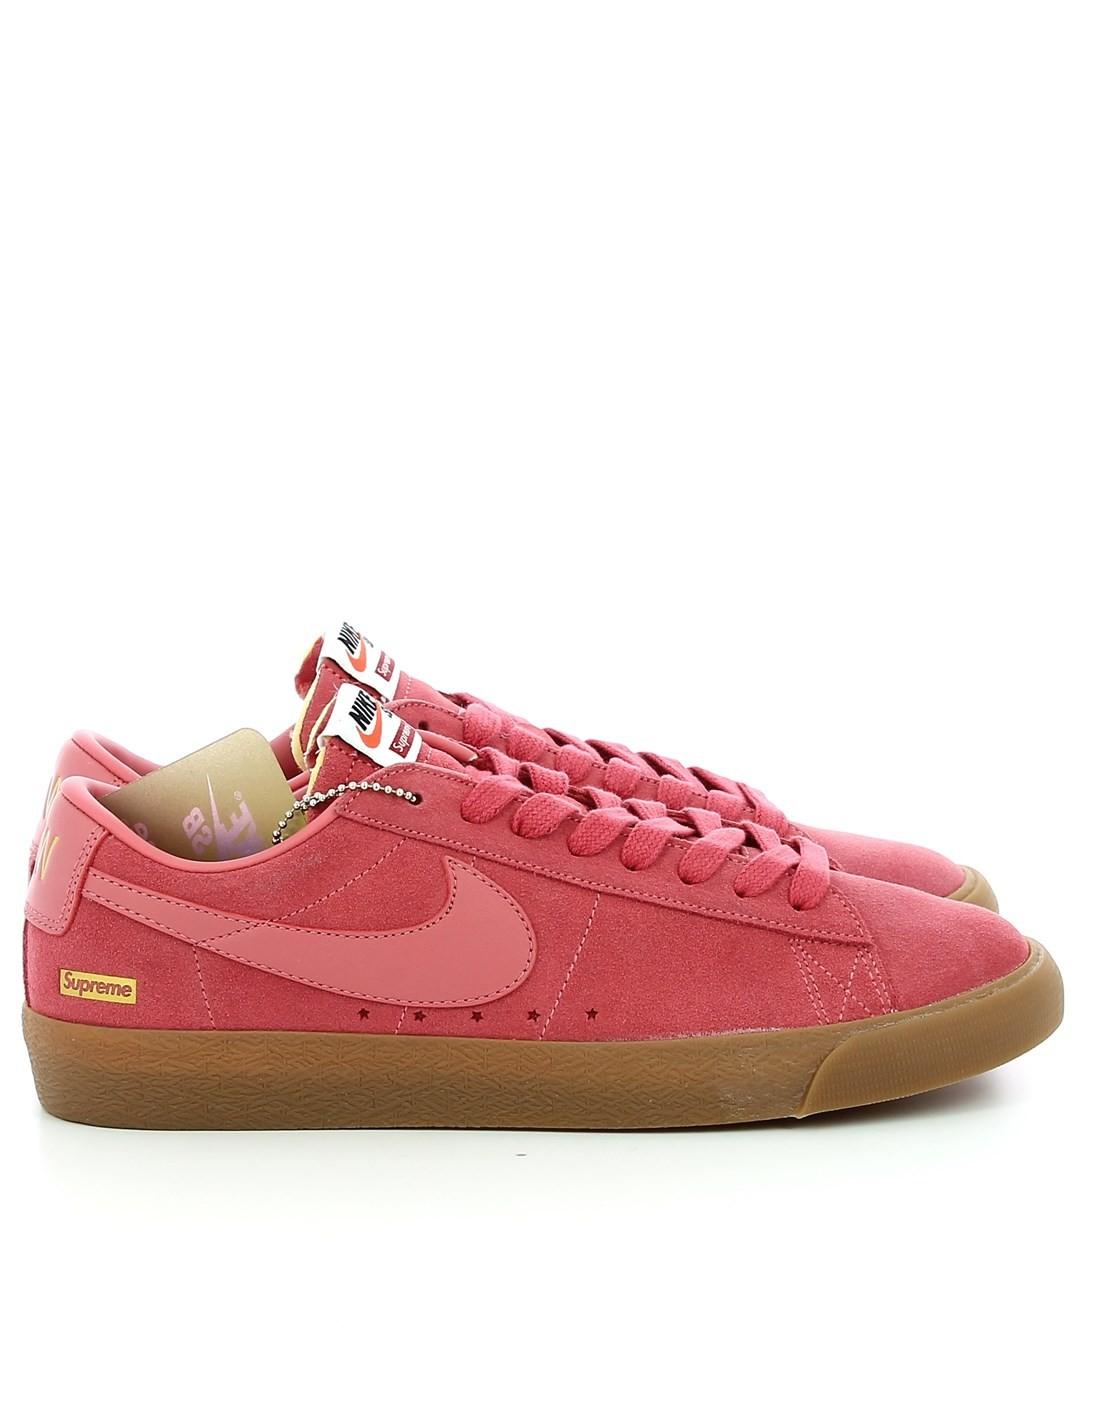 Nike Sb X Supreme Blazer Low Gt Qs The World